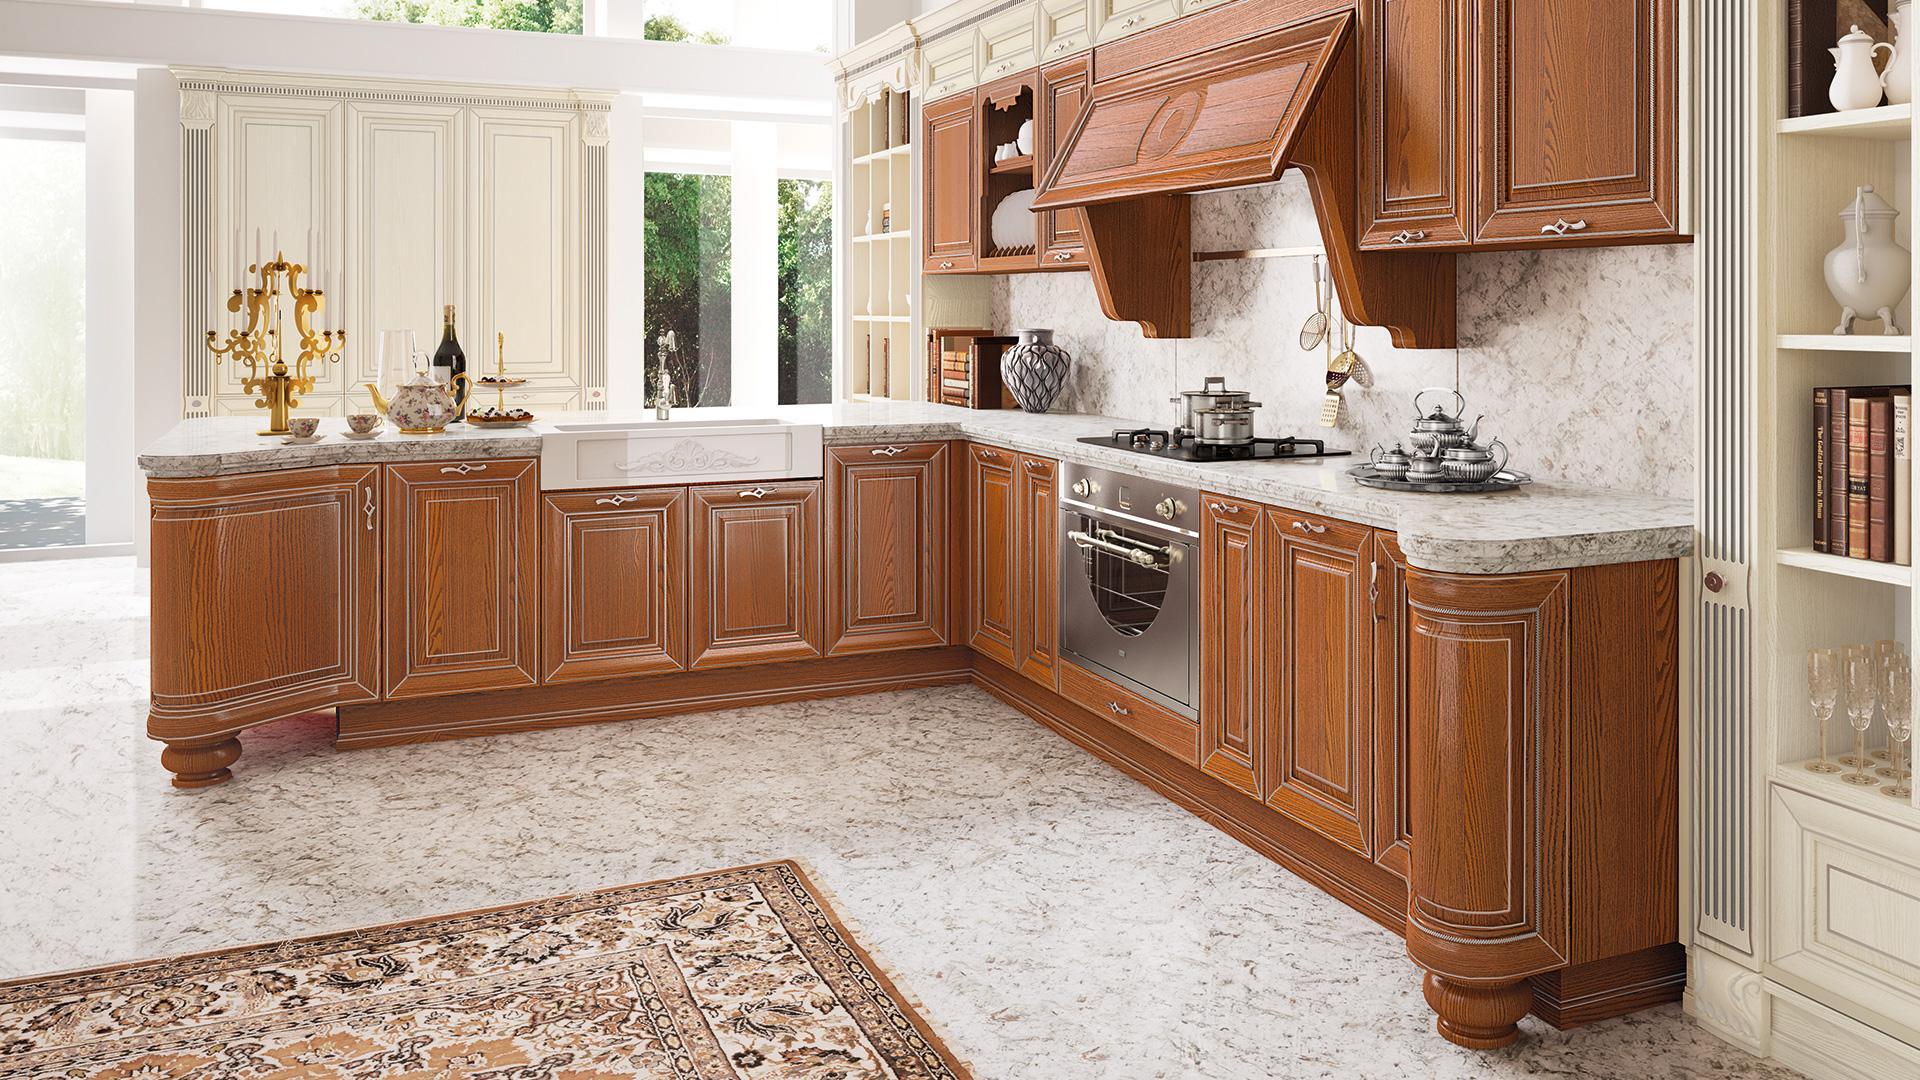 Soluzioni Arredamento Sala Cucina : Soluzioni arredamento sala ...